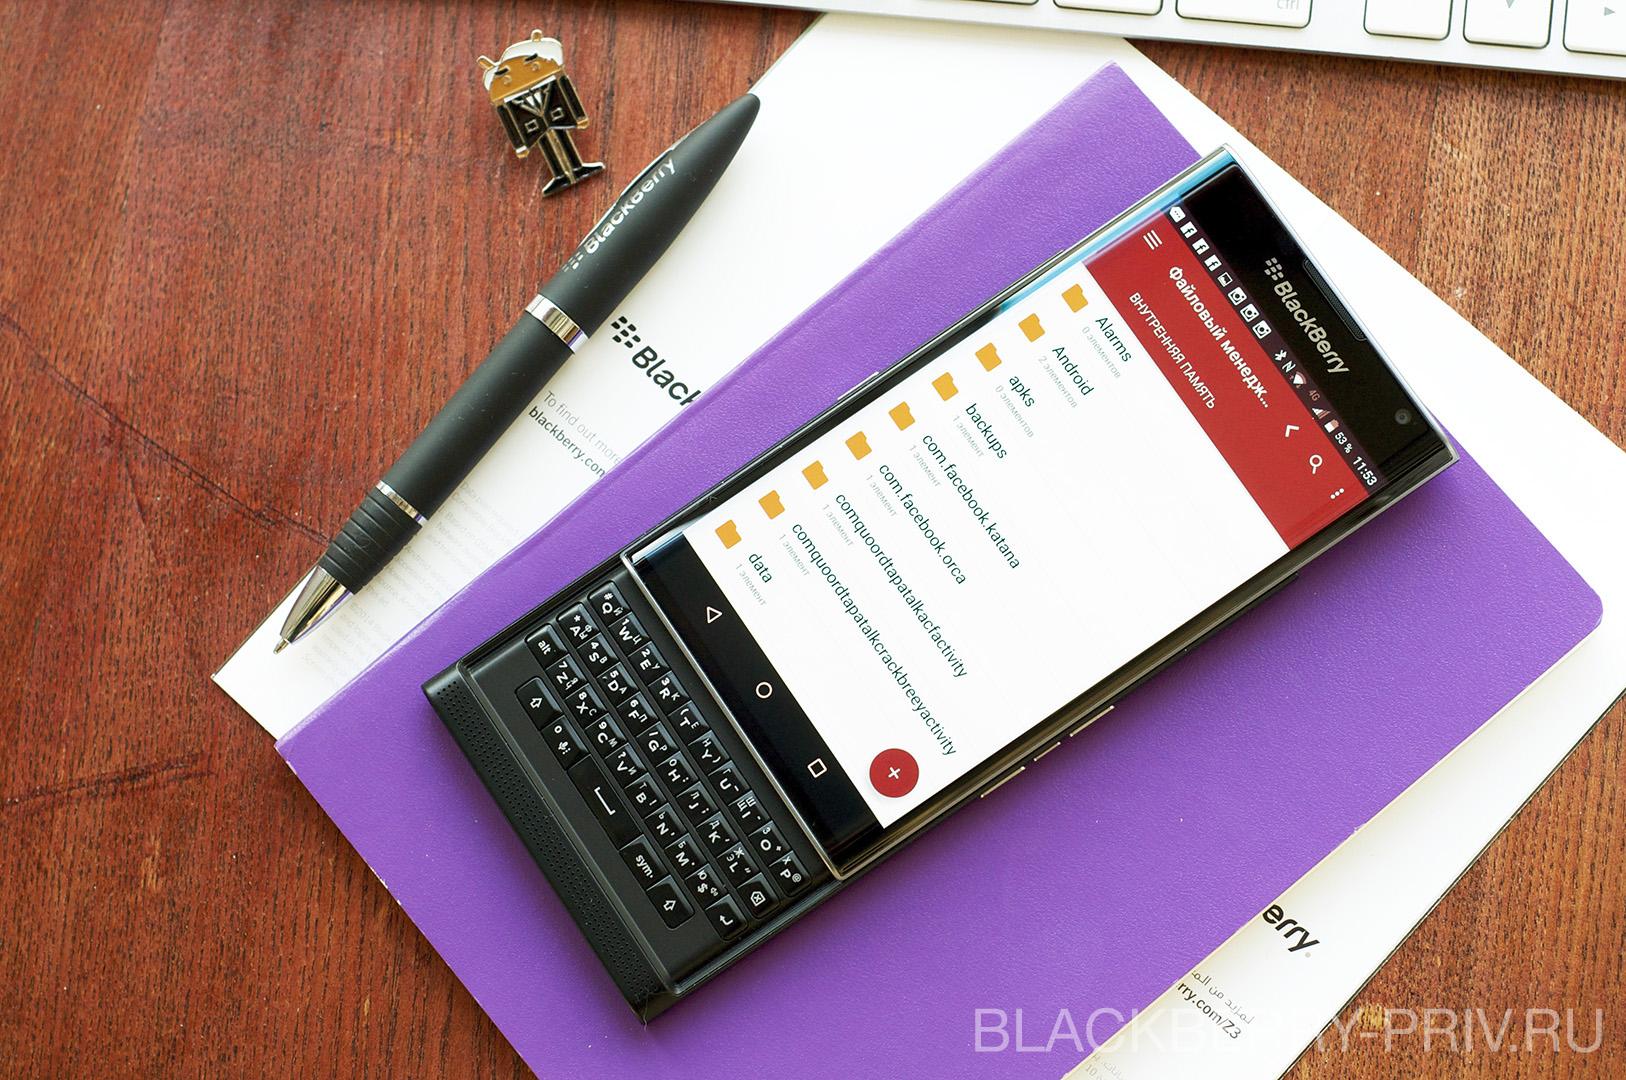 BlackBerry-PRIV-FM-15